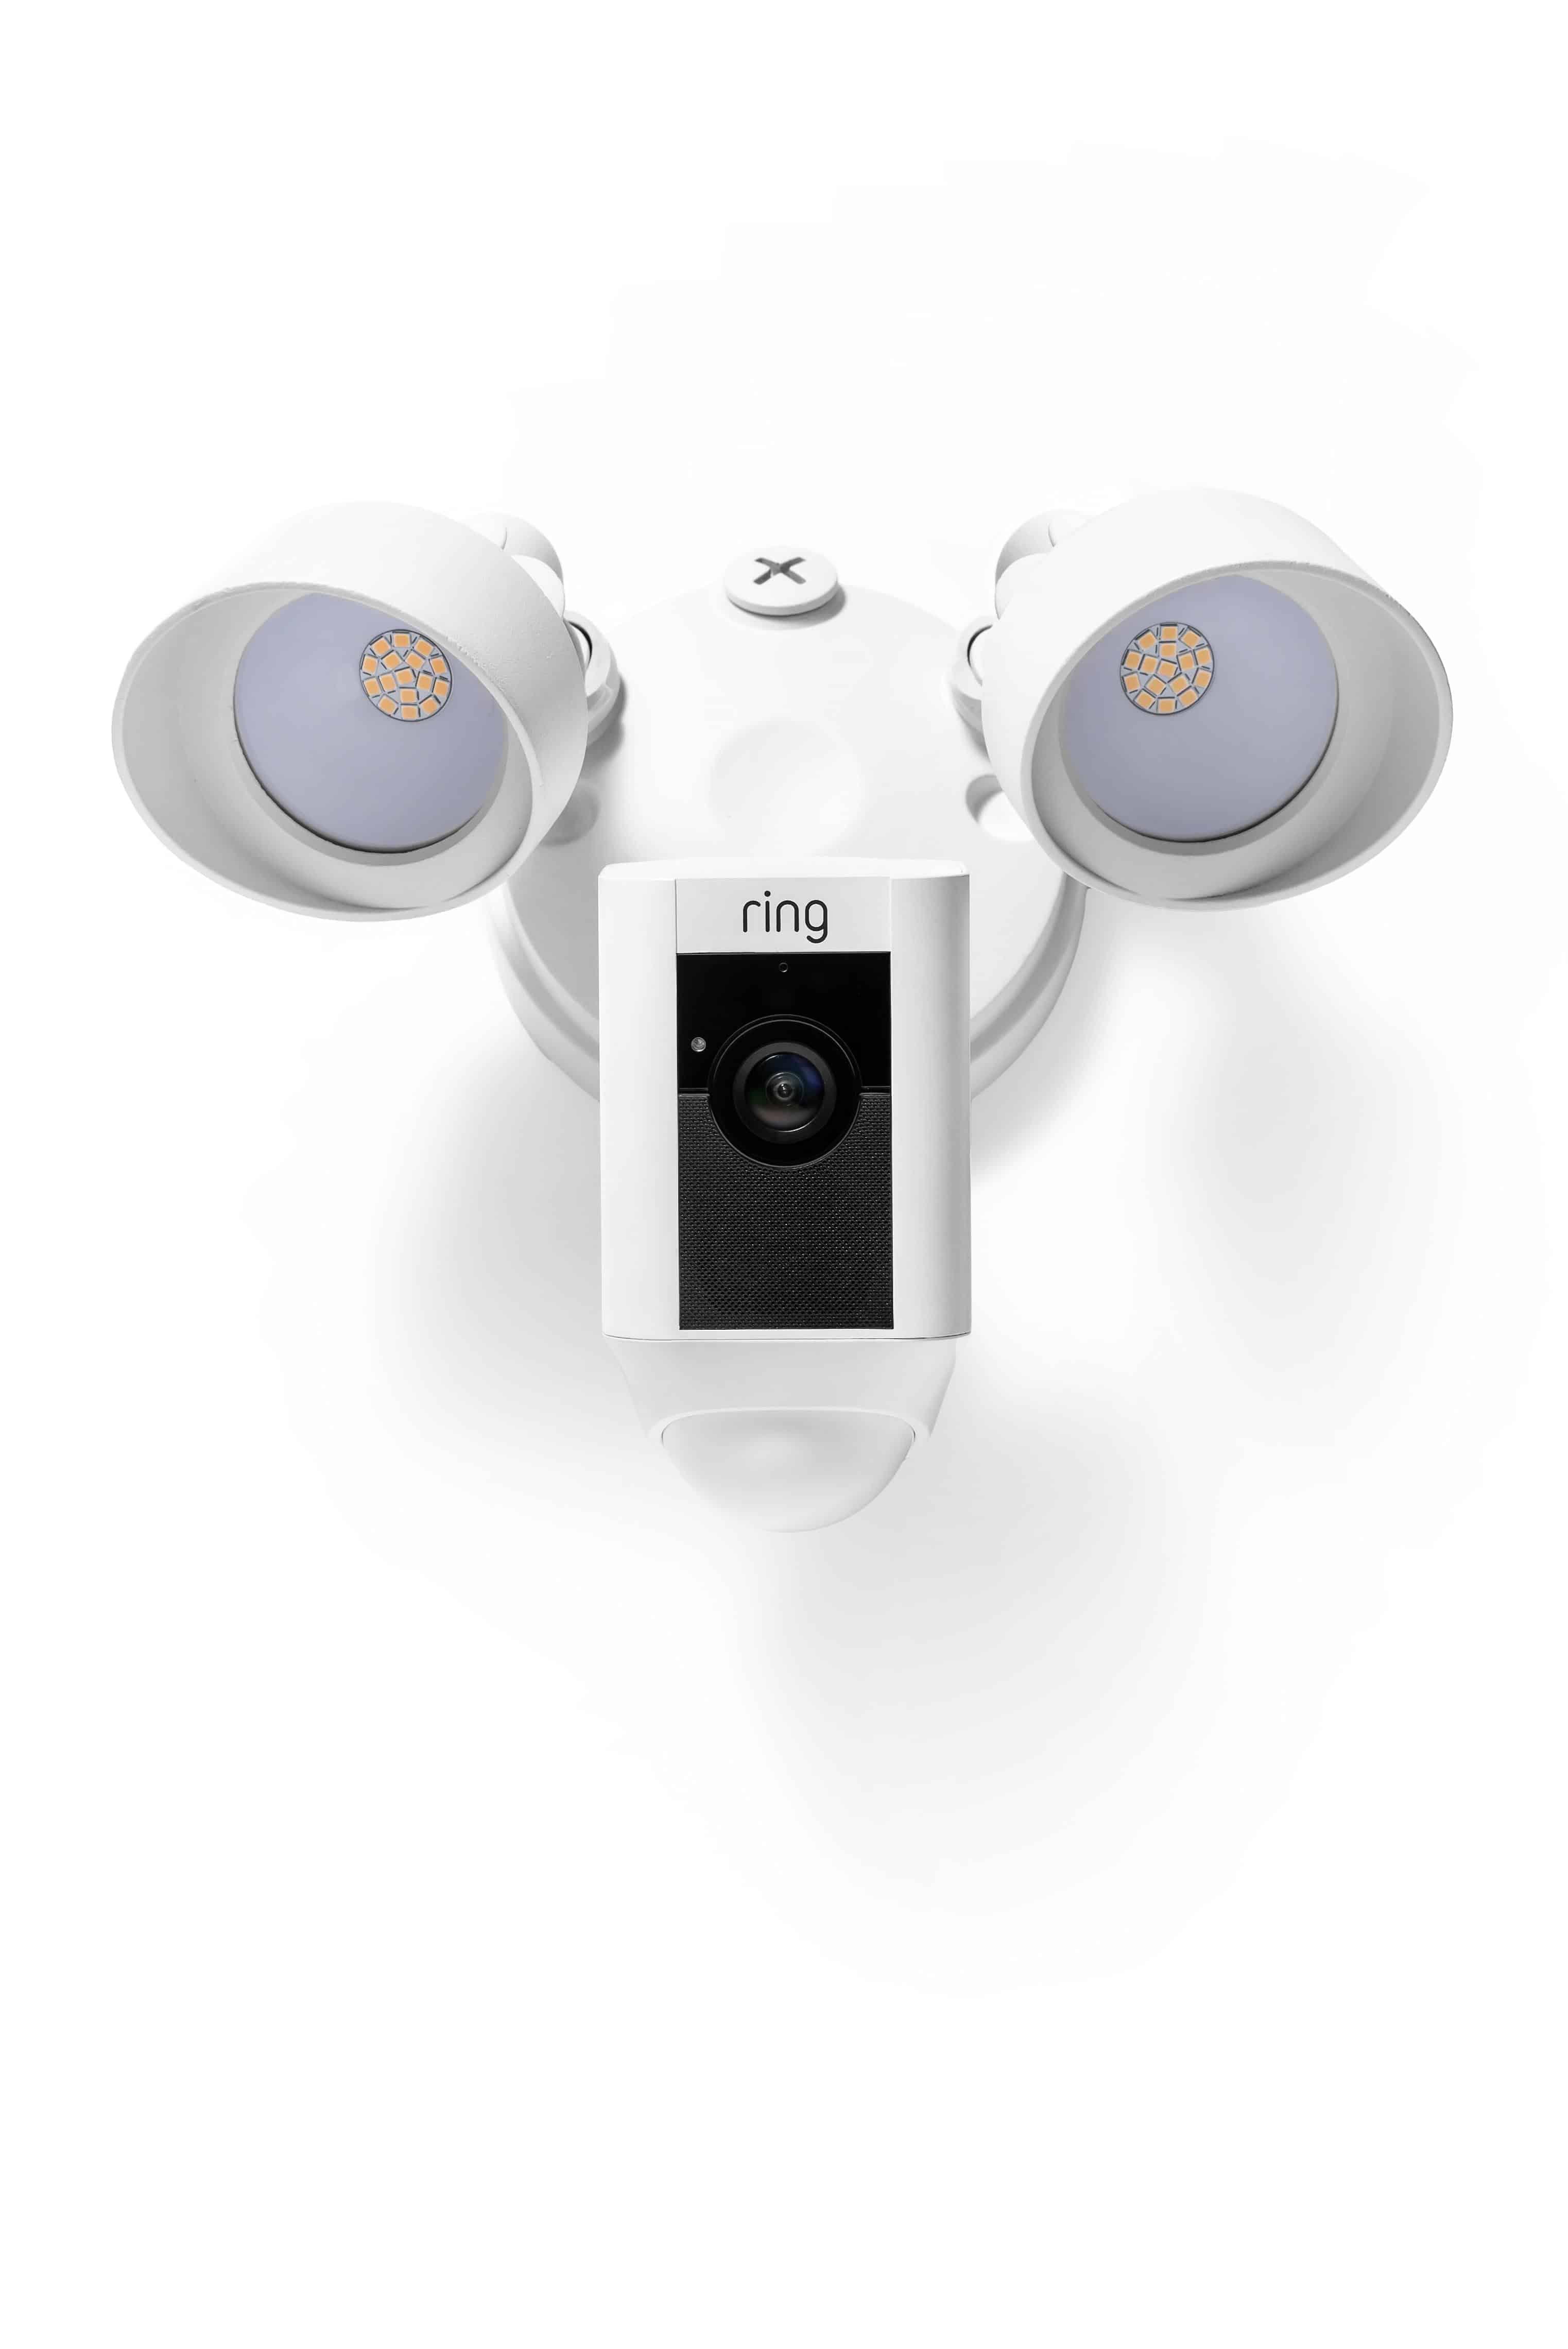 Ring Floodlight Cam 2